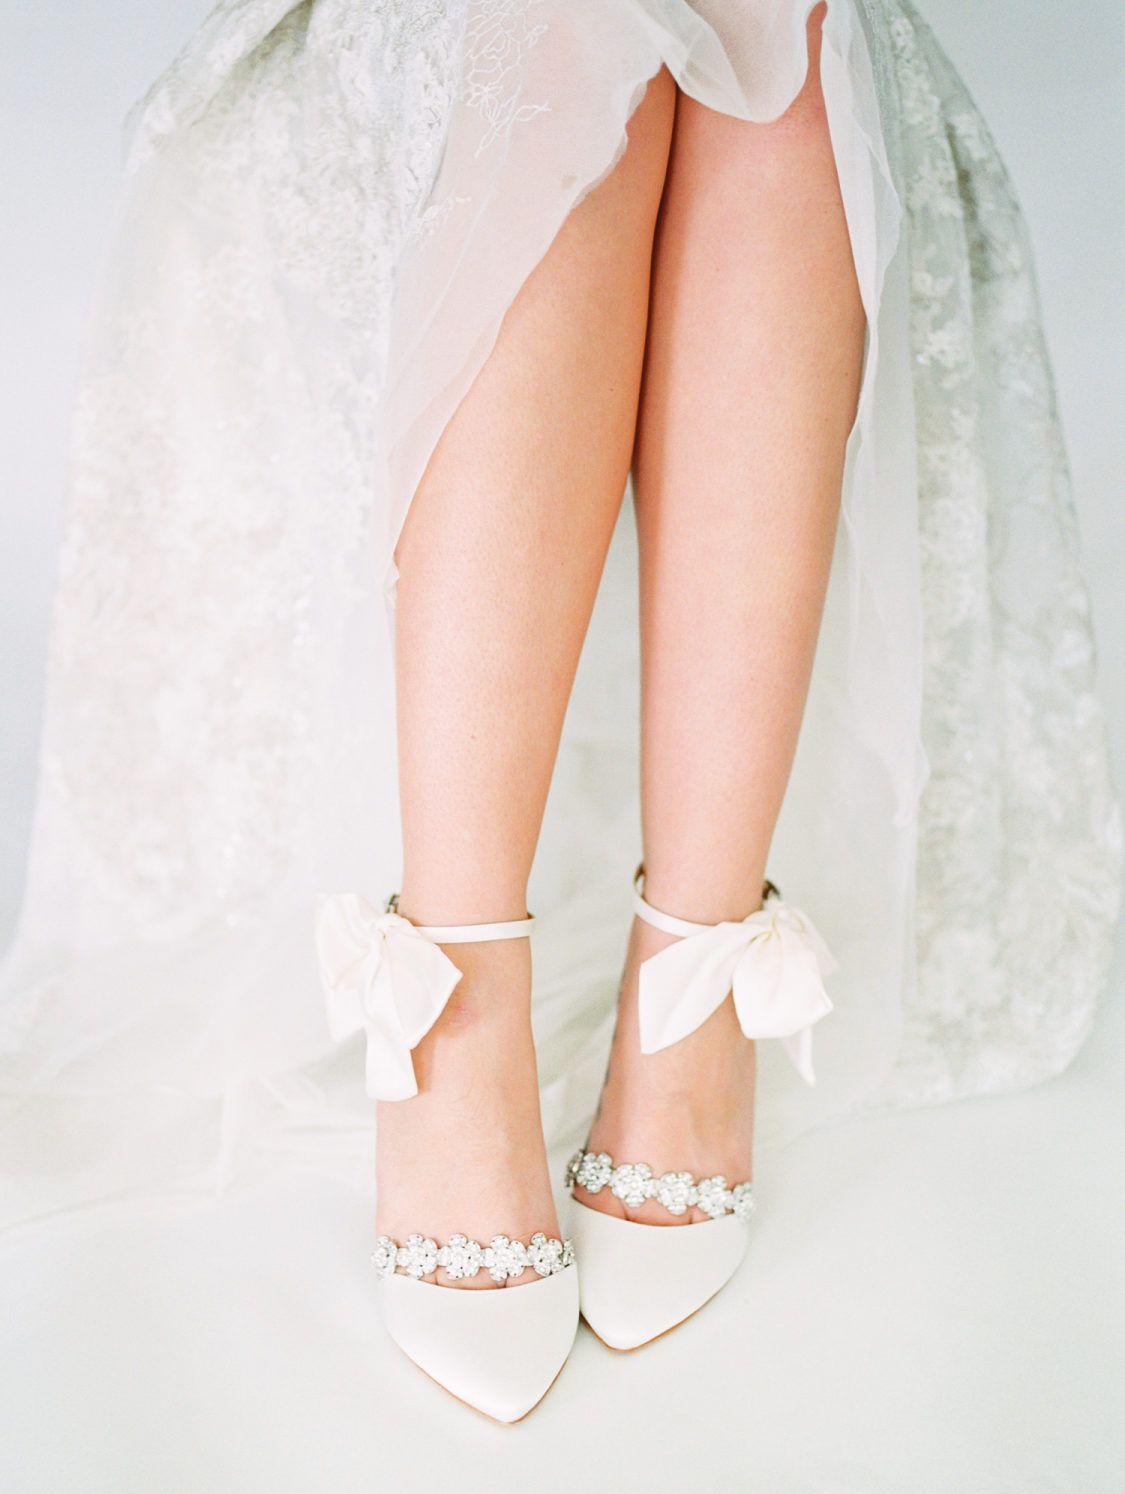 Modern Amalfi Coast Inspired Wedding Shoot At Marina Del Ray Ritz